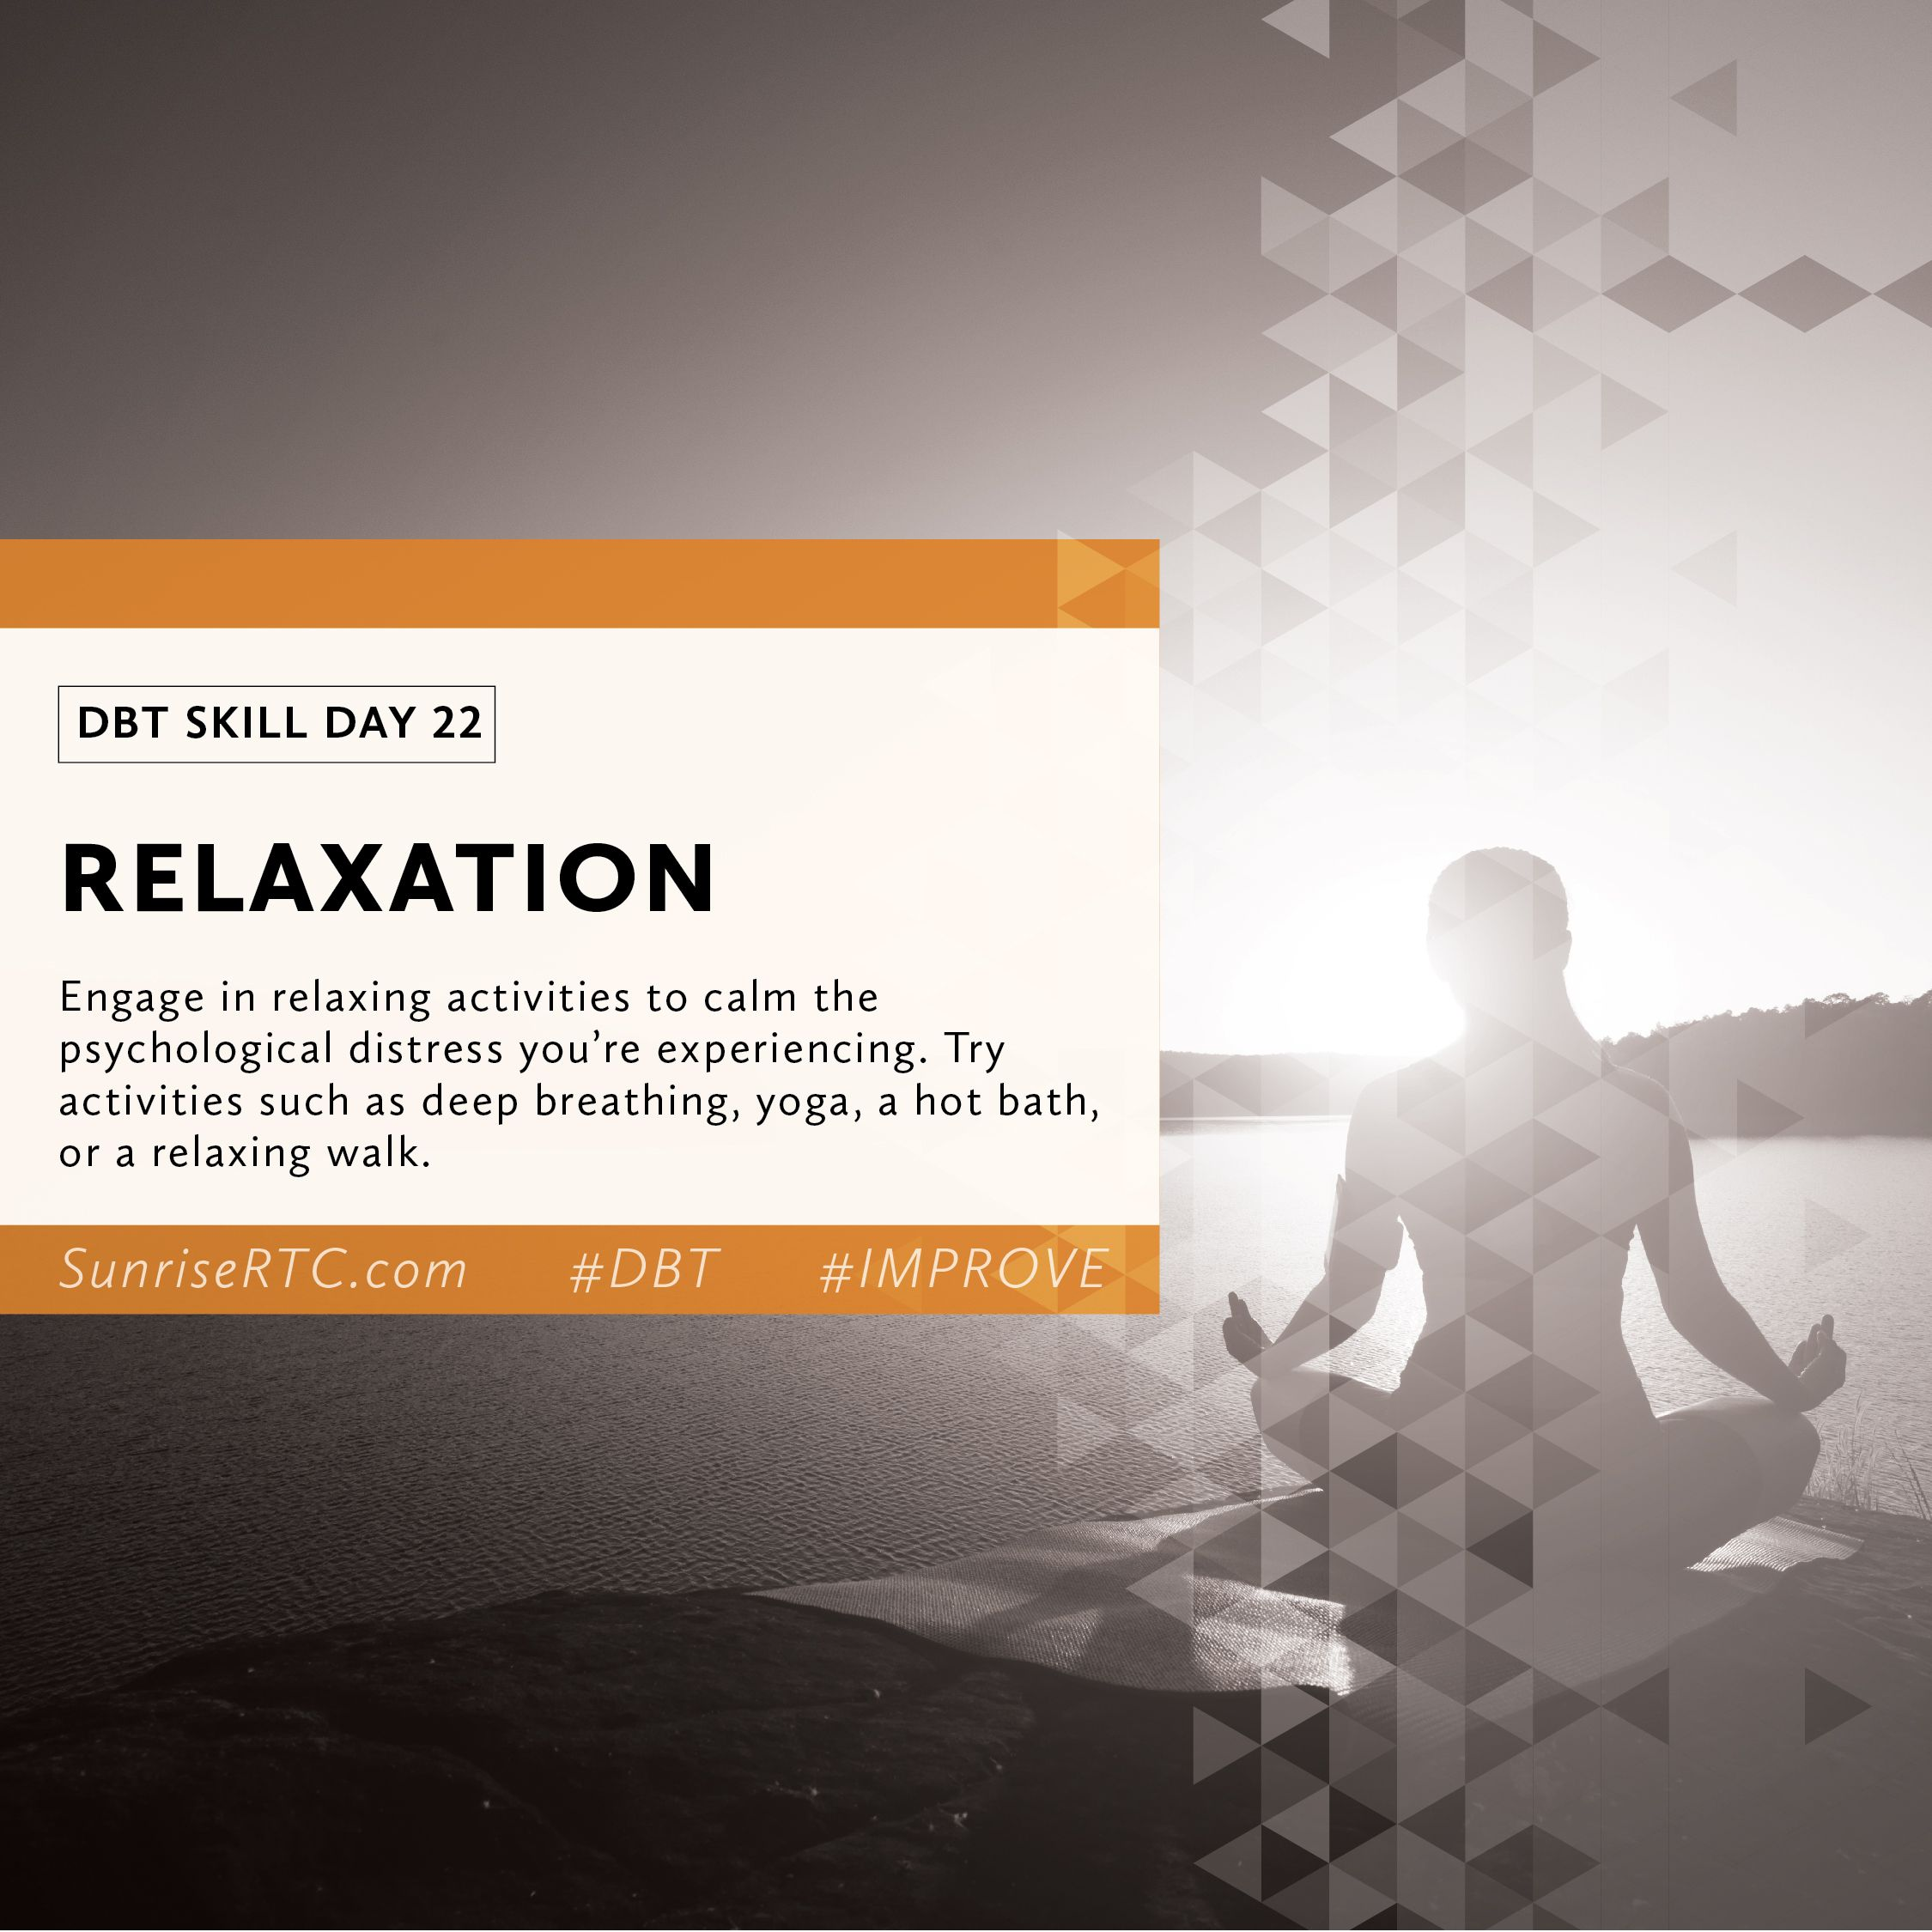 Dbtdailytip Dbt Relaxation Tipoftheday Mentalhealth